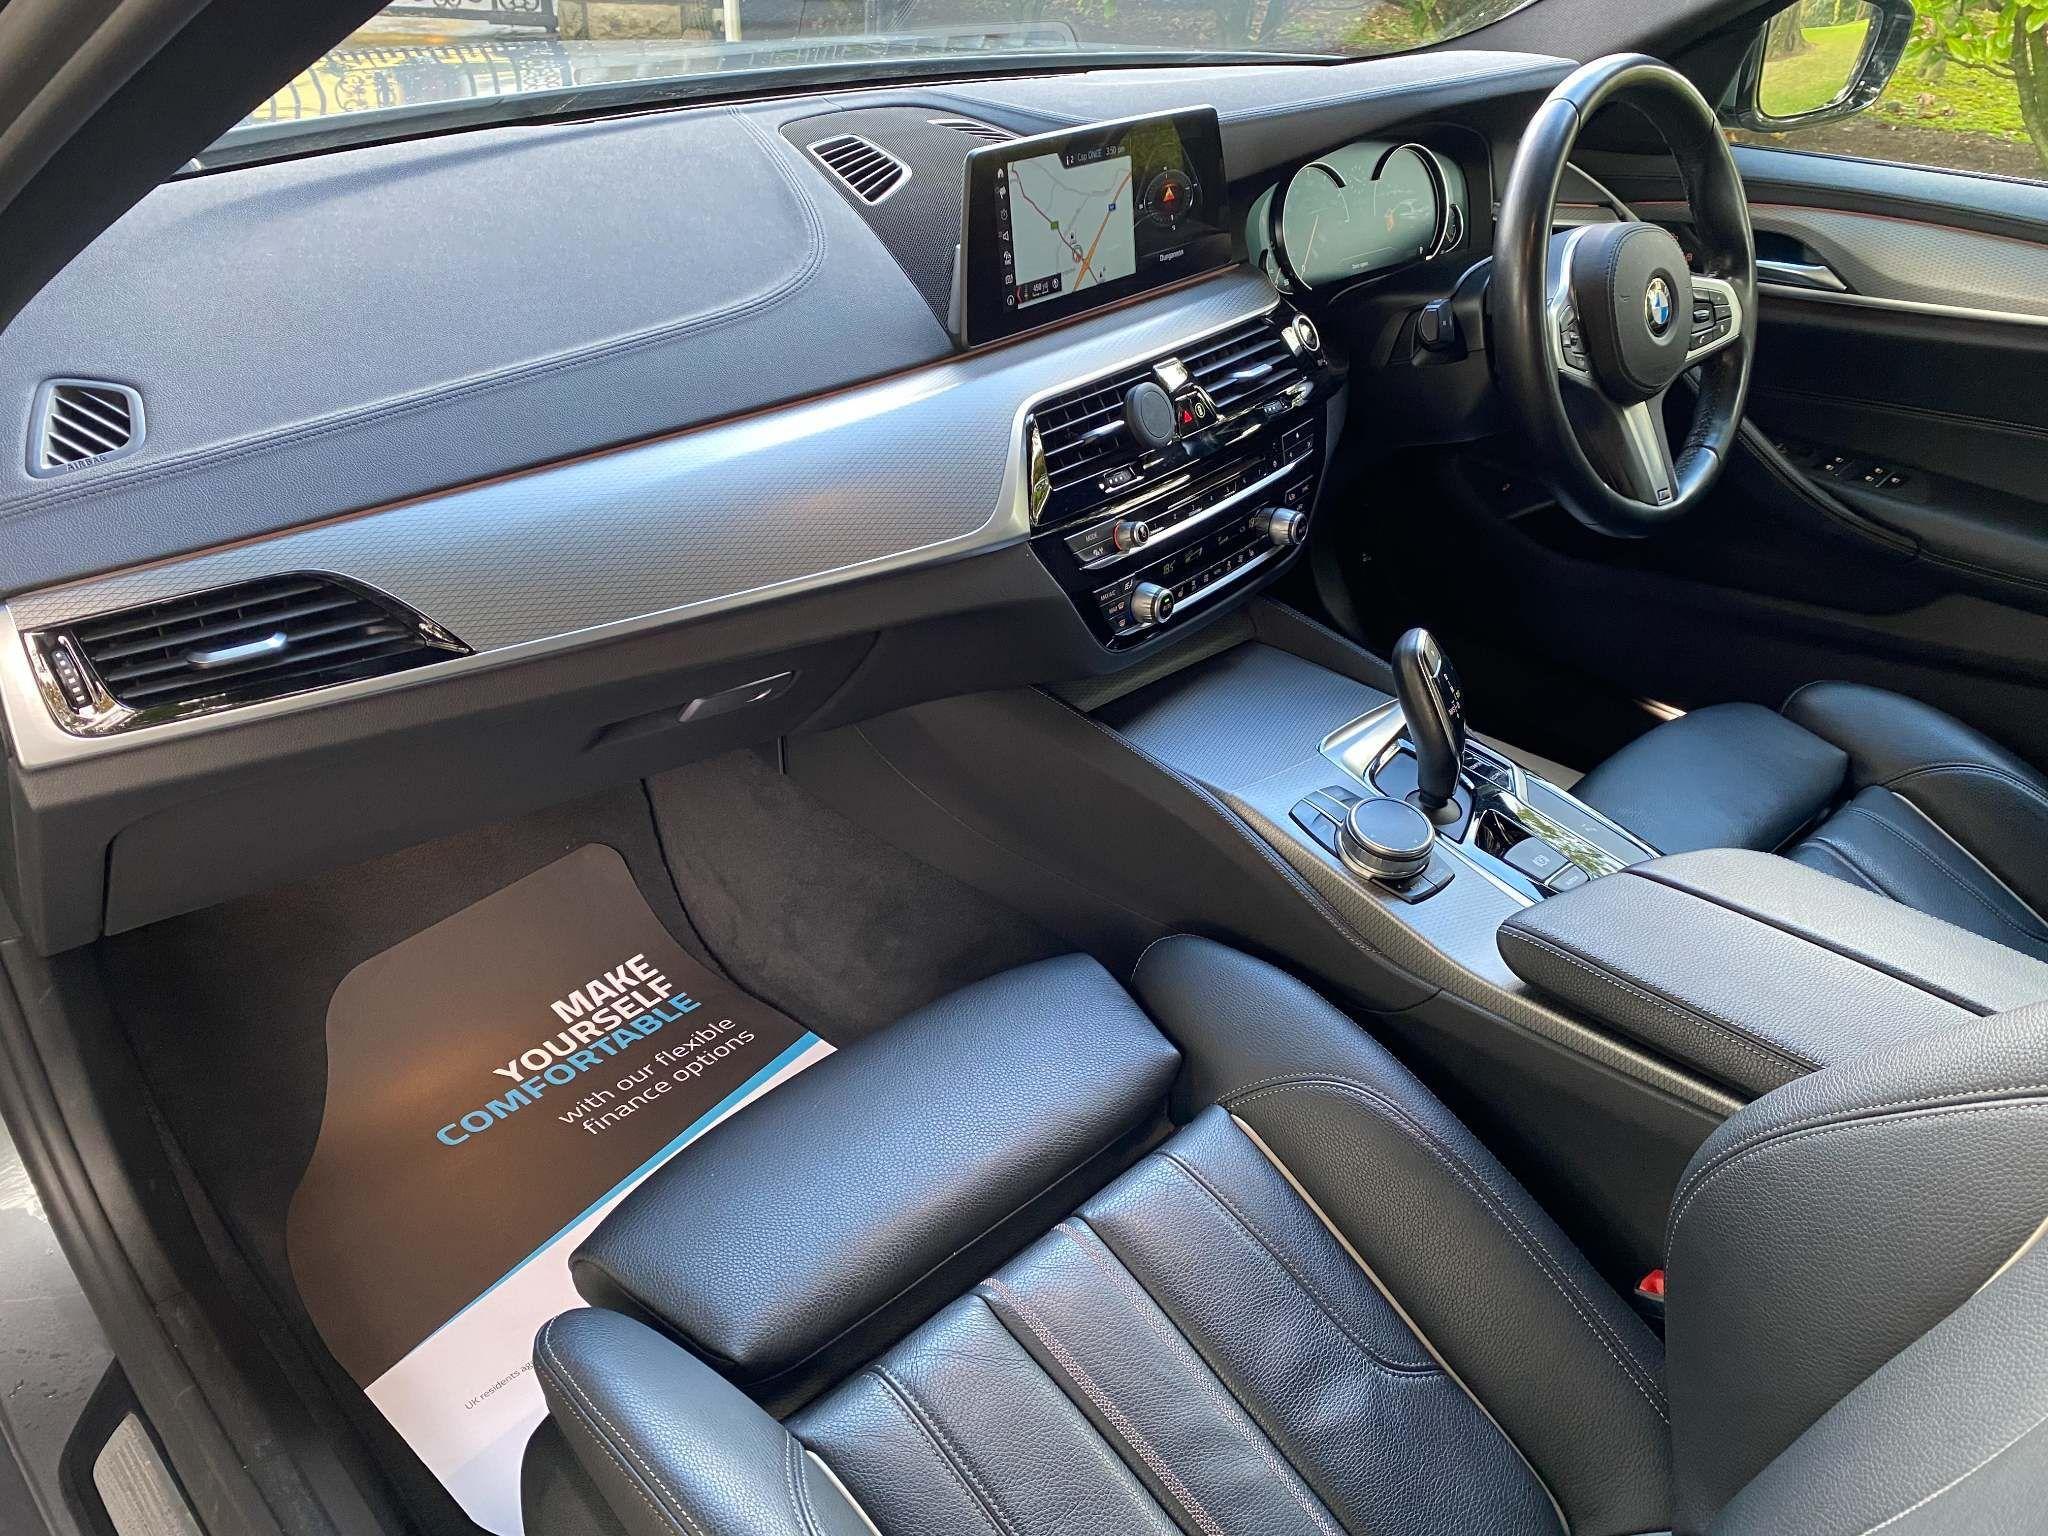 2017 BMW 5 Series 2.0 520d M Sport Auto (s/s) 4dr Diesel Automatic – Moyway Motors Dungannon full